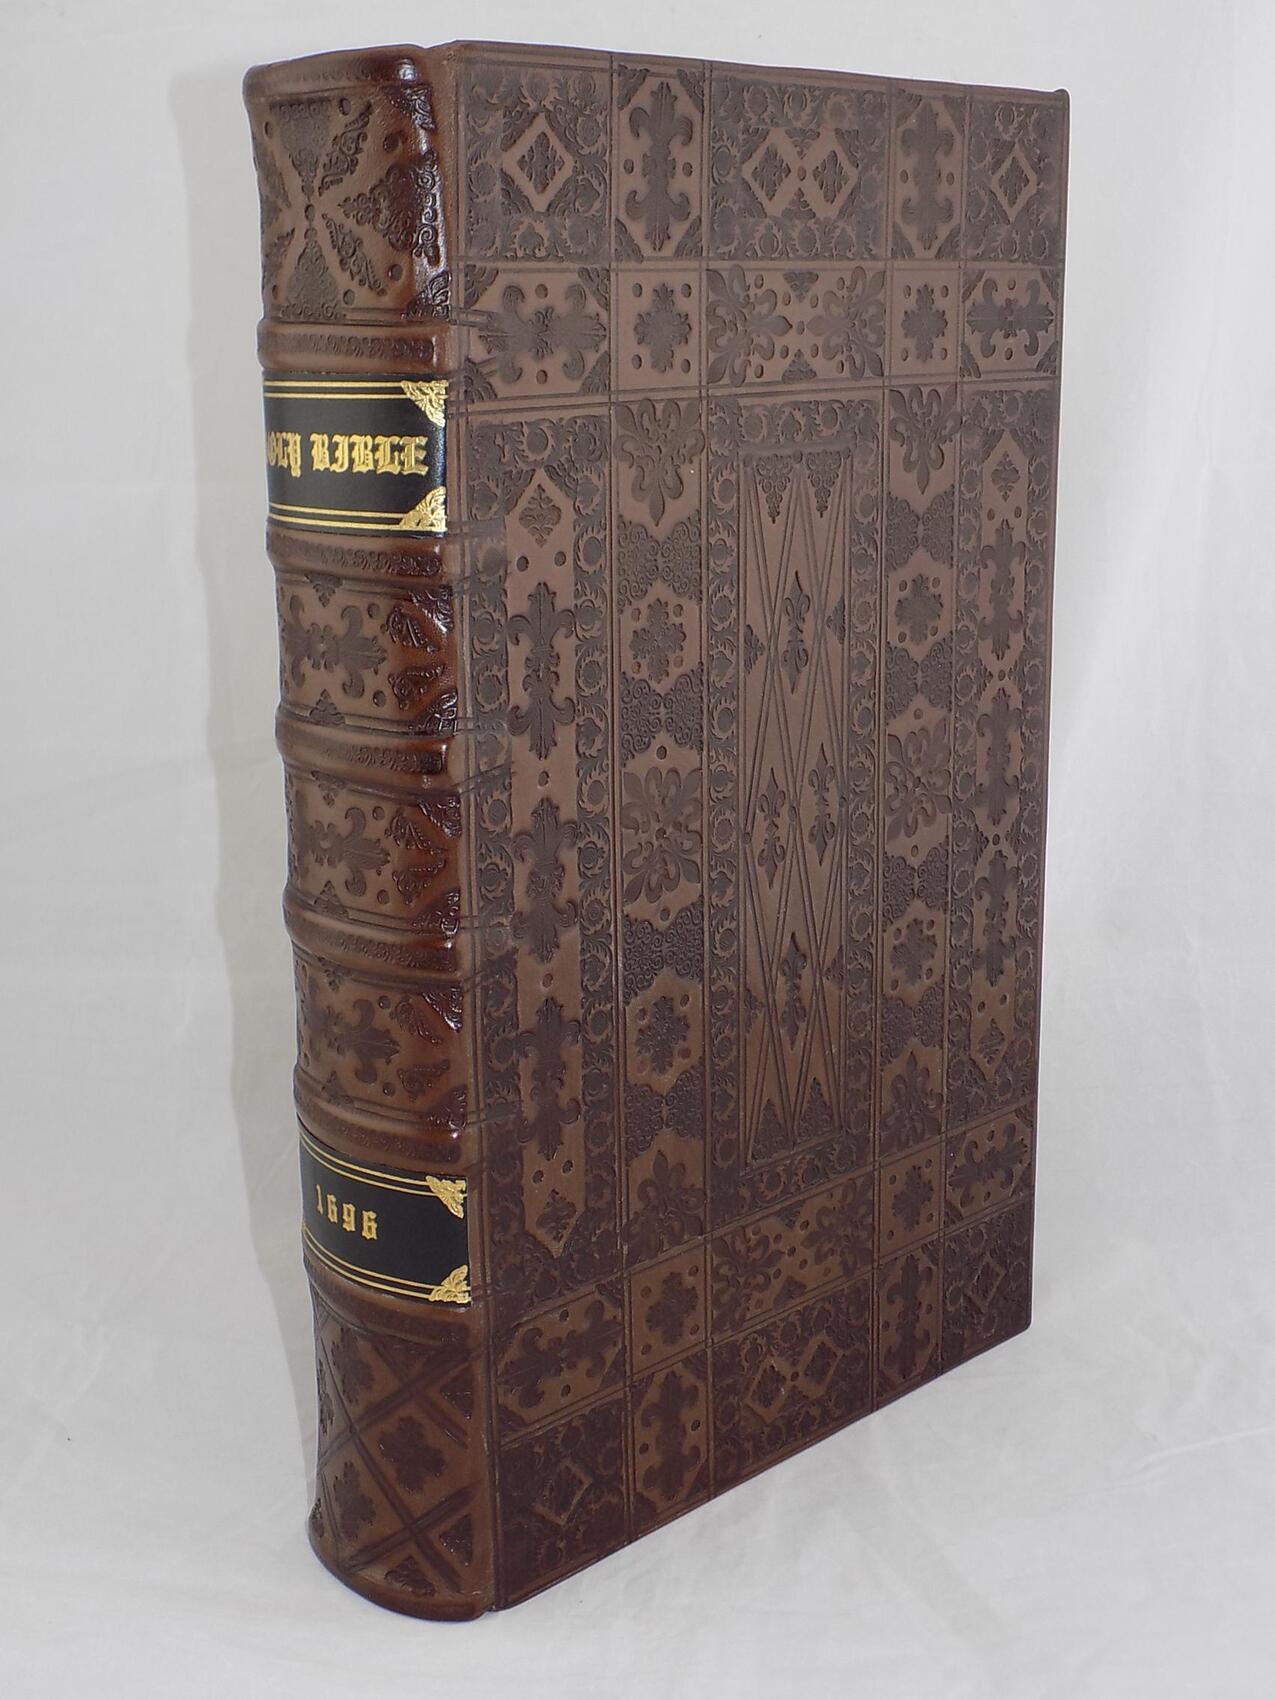 1696 KING JAMES BIBLE